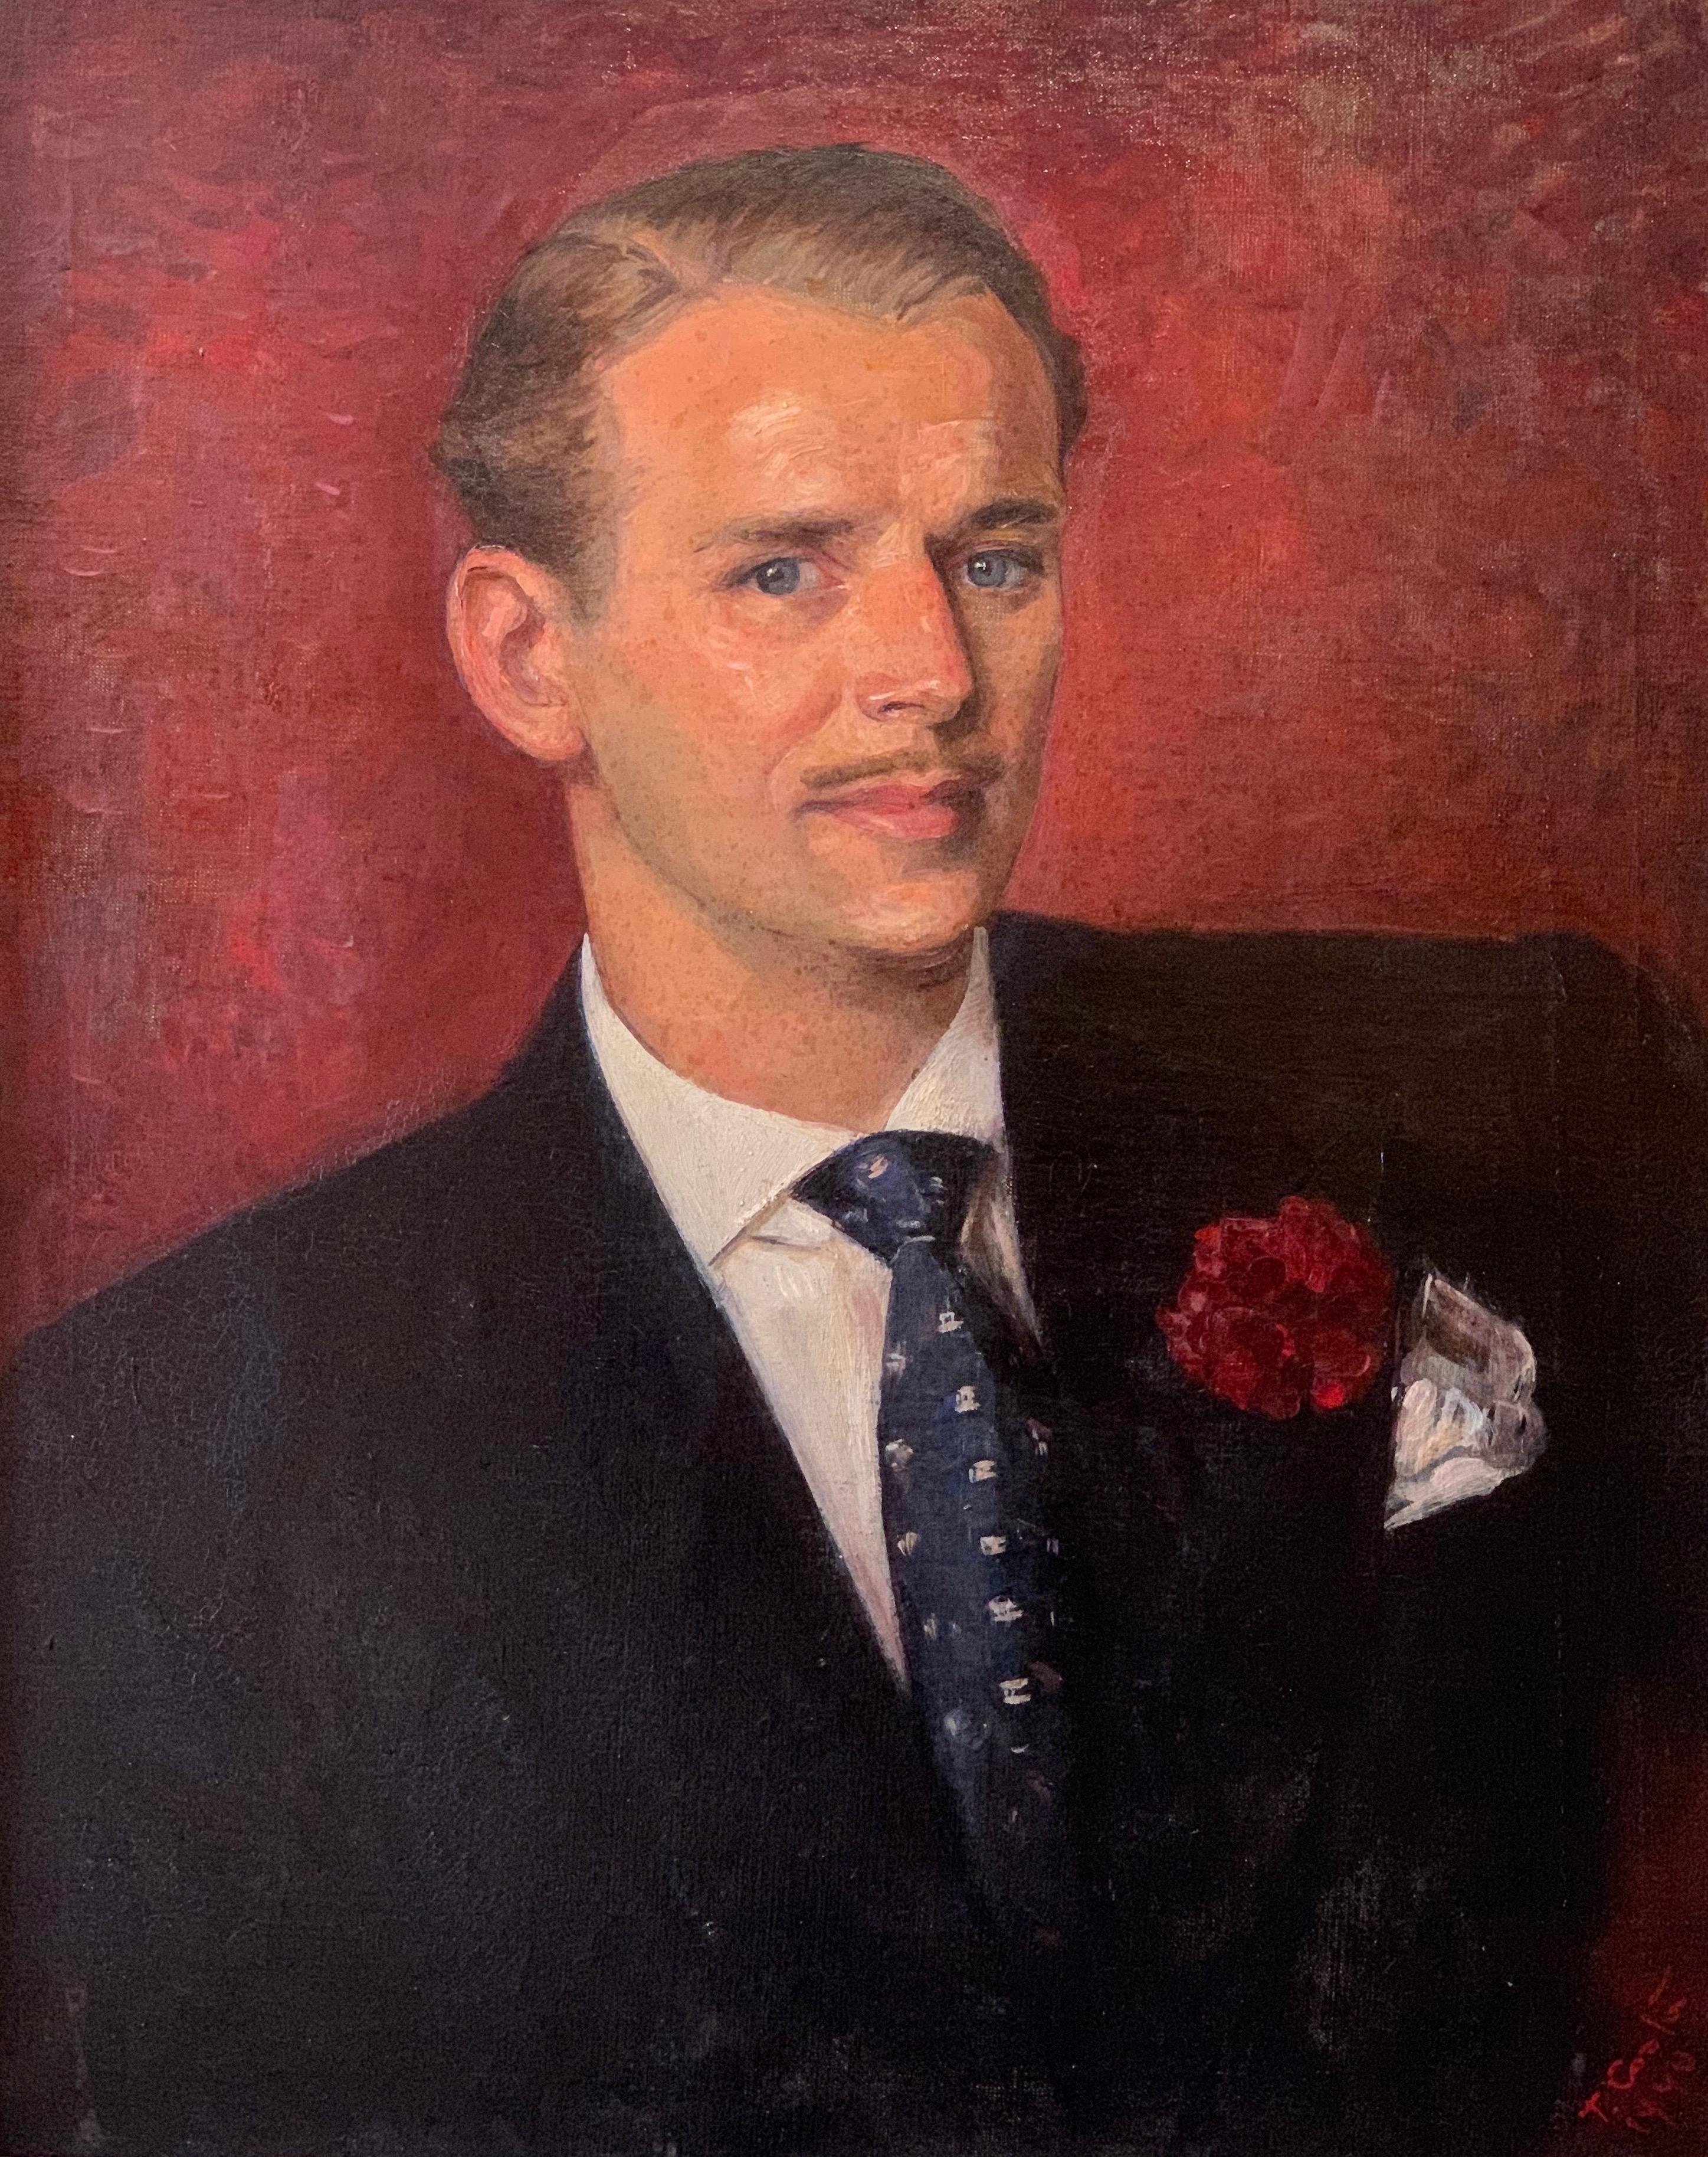 Douglas Fairbanks Jnr. Period 1940's Original Portrait of Fairbanks - Provenance